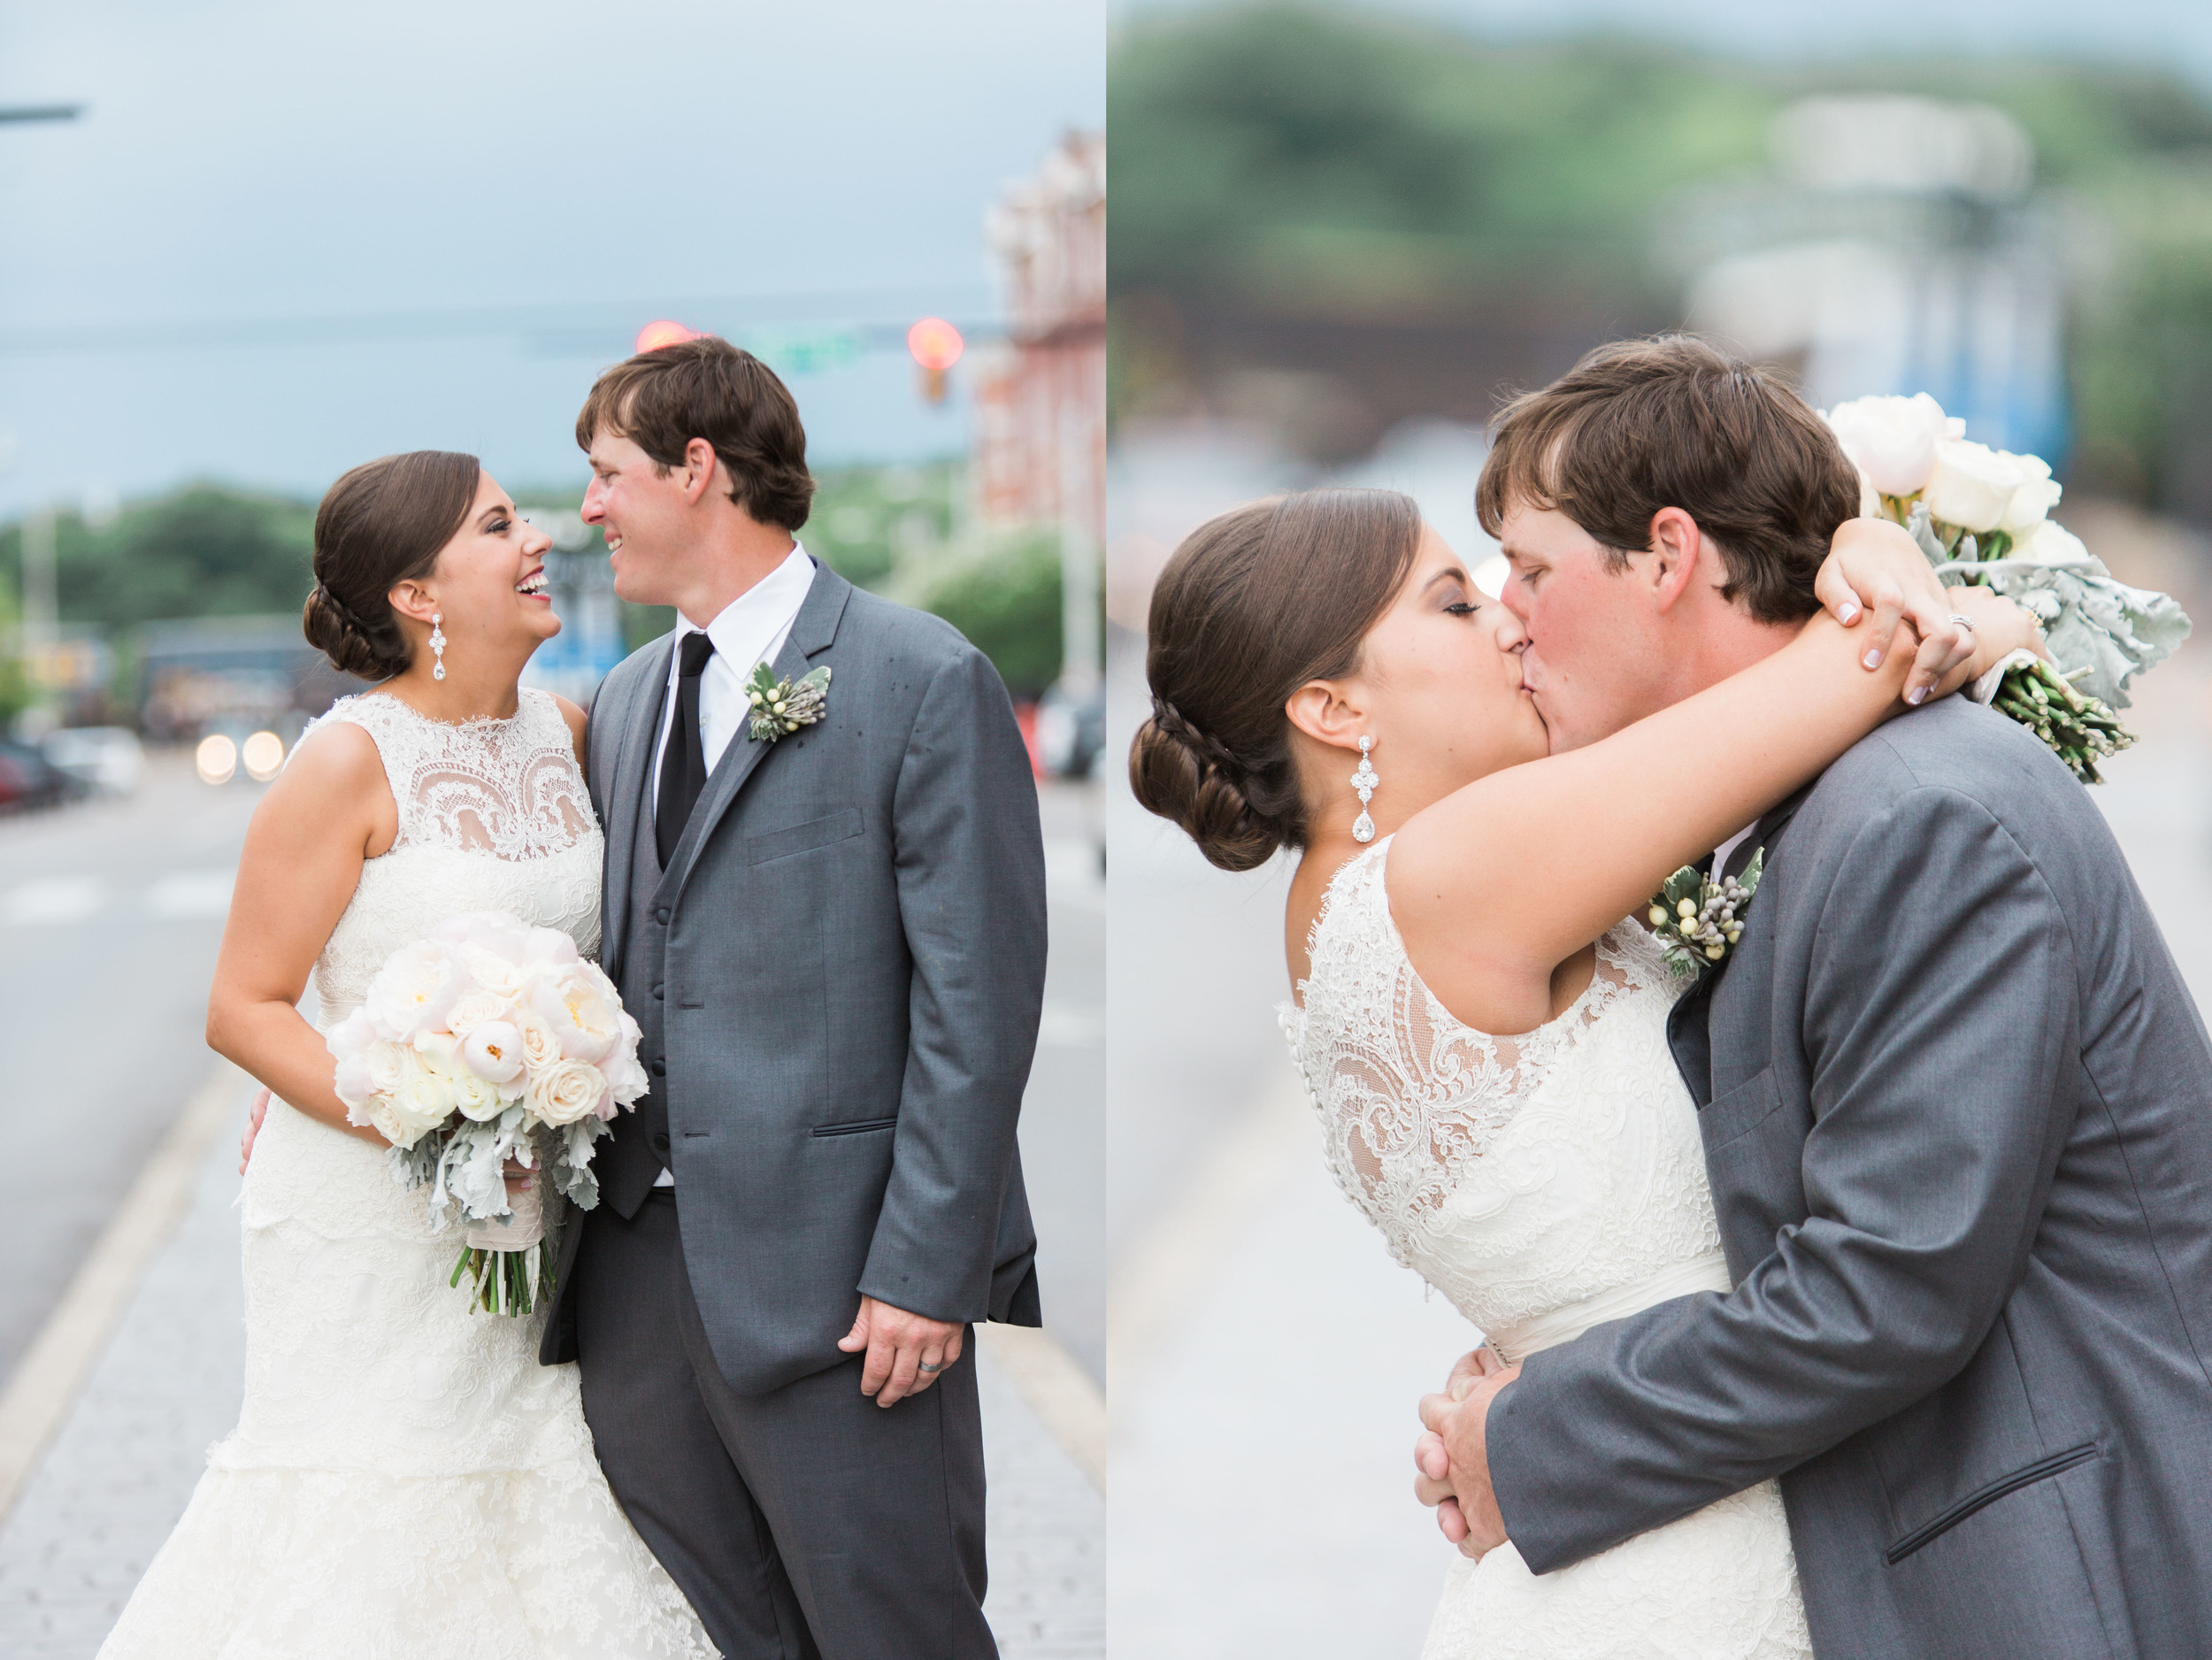 Alabama-Wedding-Photographers-Nick-Elizabeth-Drollette-132.jpg